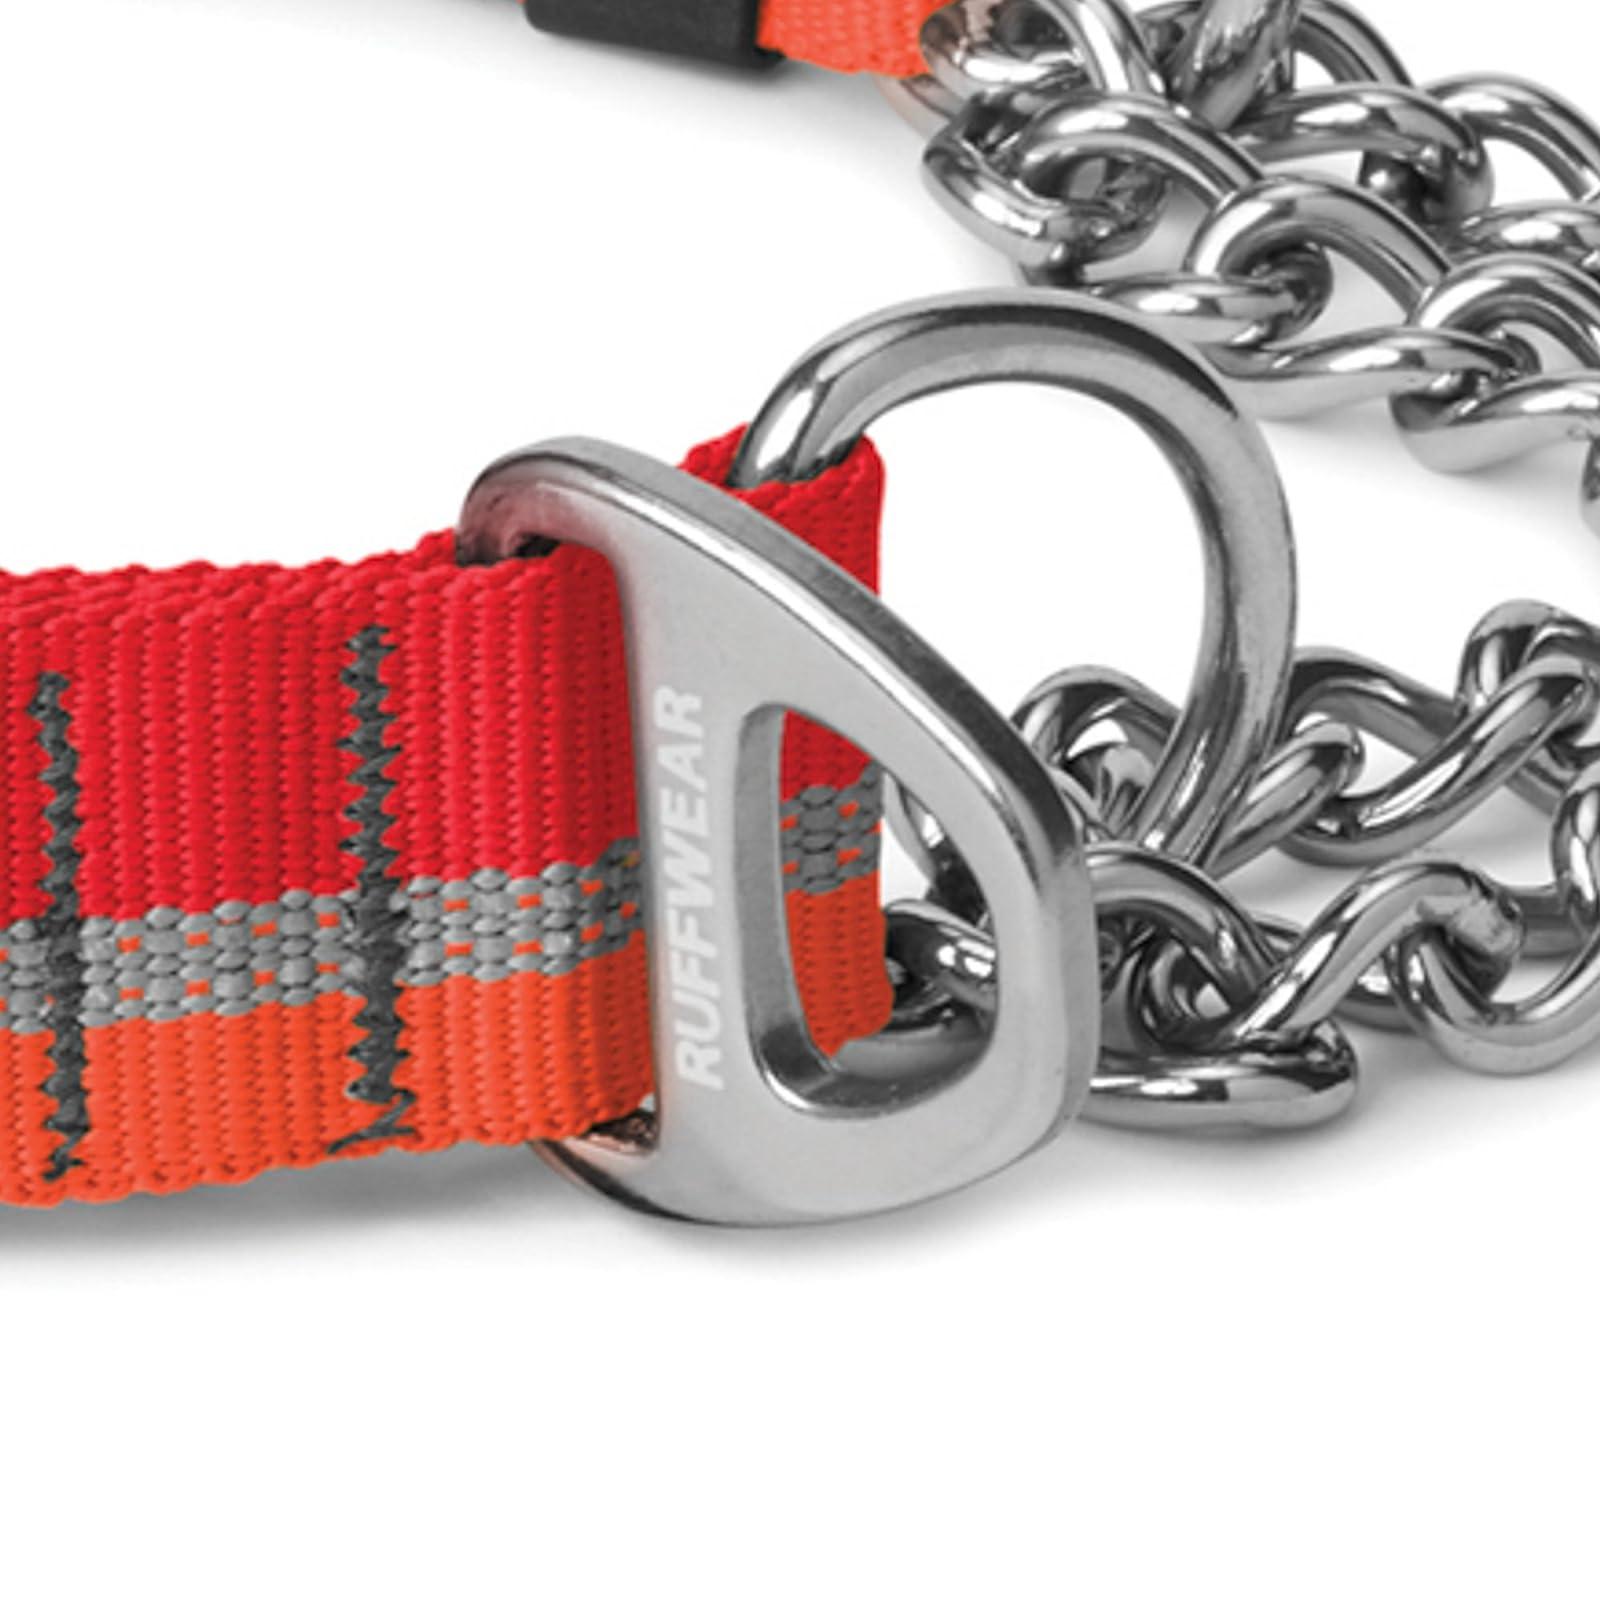 RUFFWEAR Chain Reaction Collar Medium Kokanee Red - 3